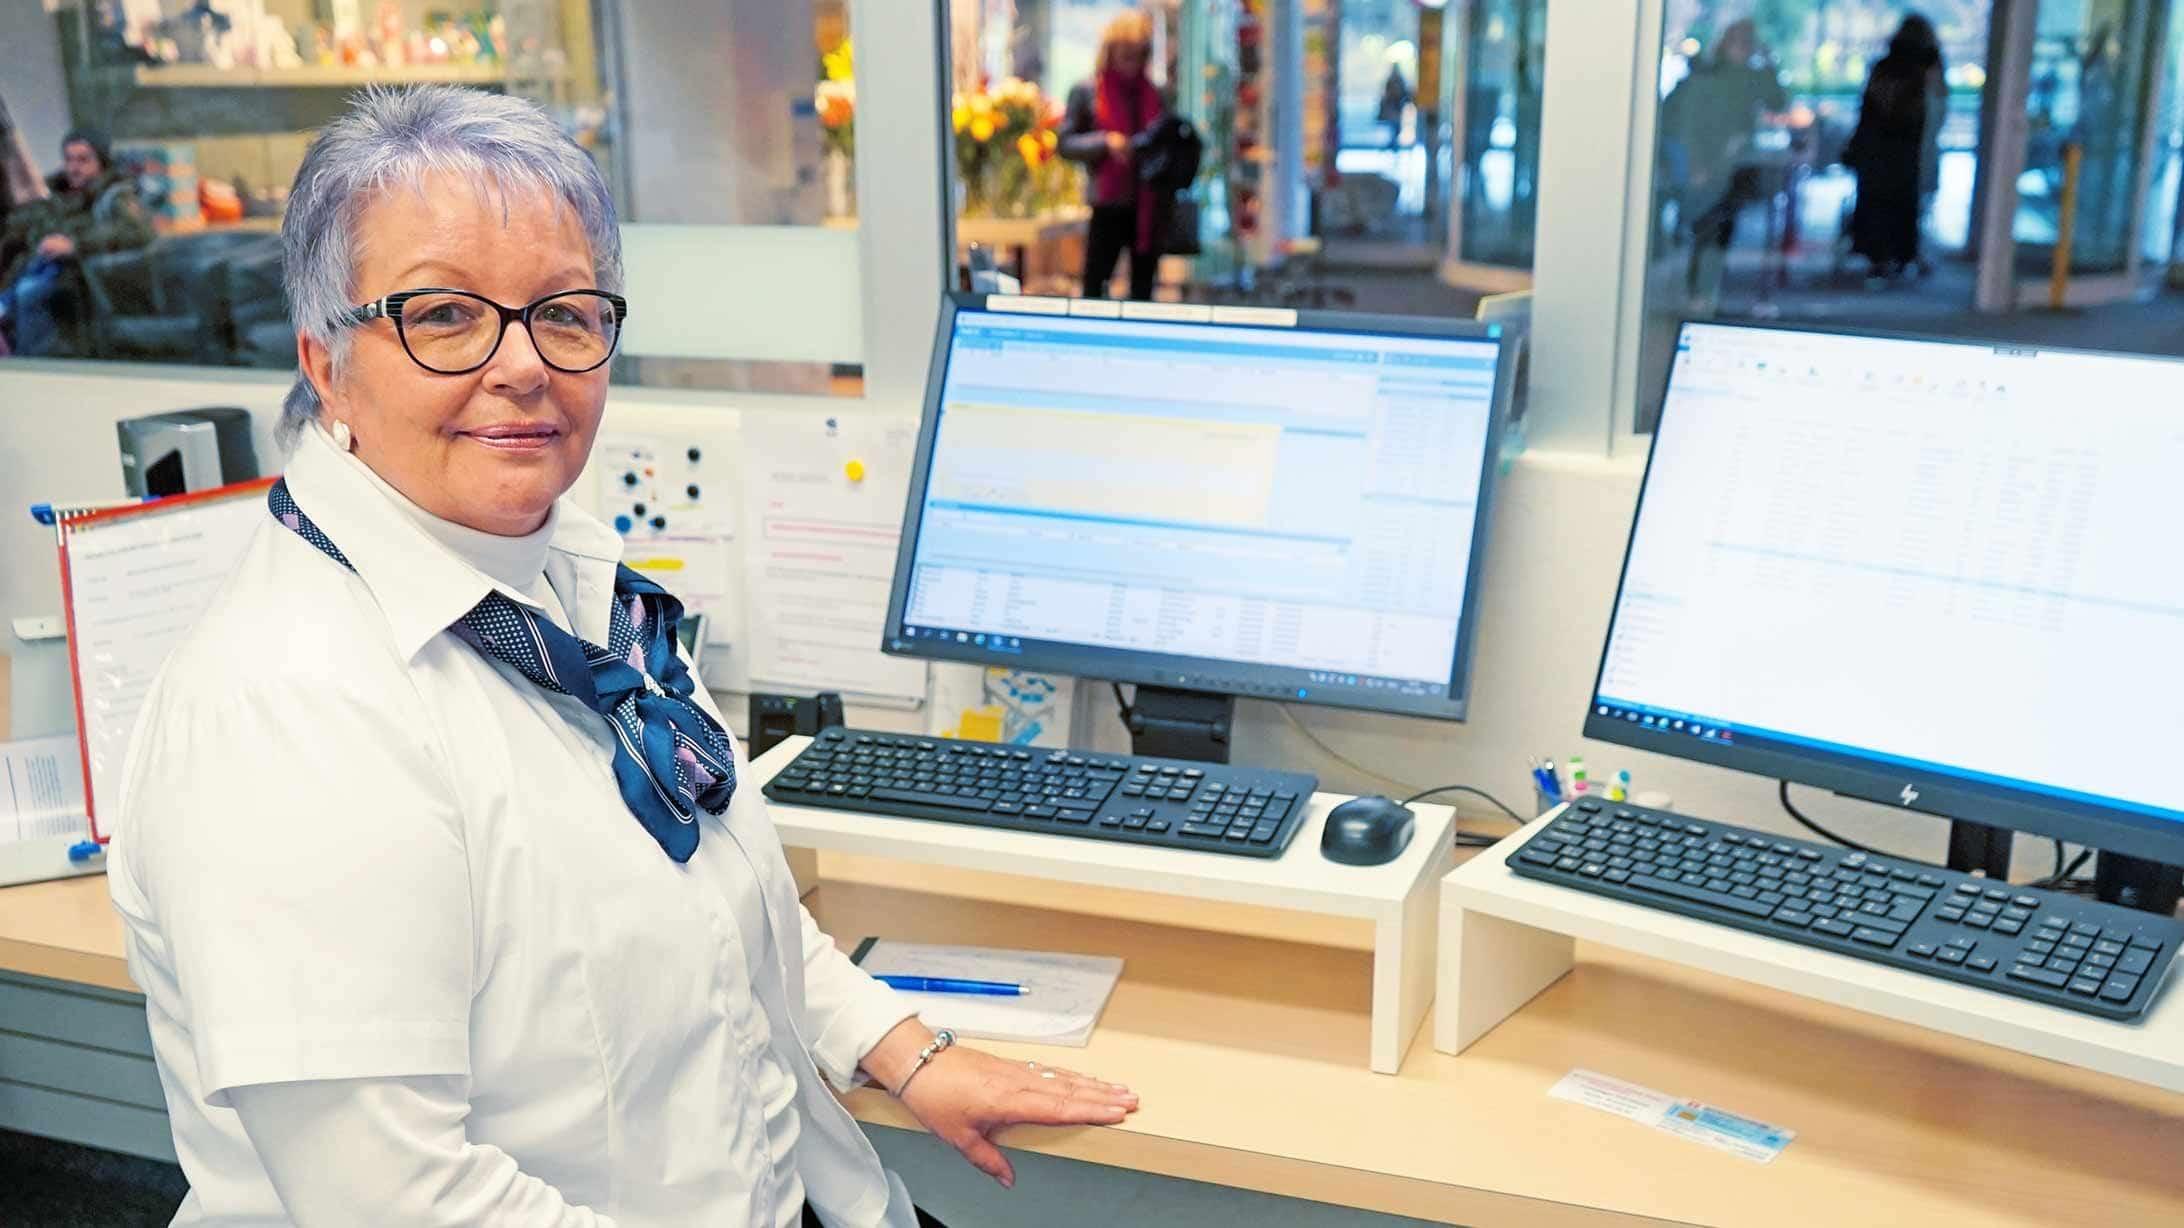 Susanne Schneider betreut den Empfang am KSB.